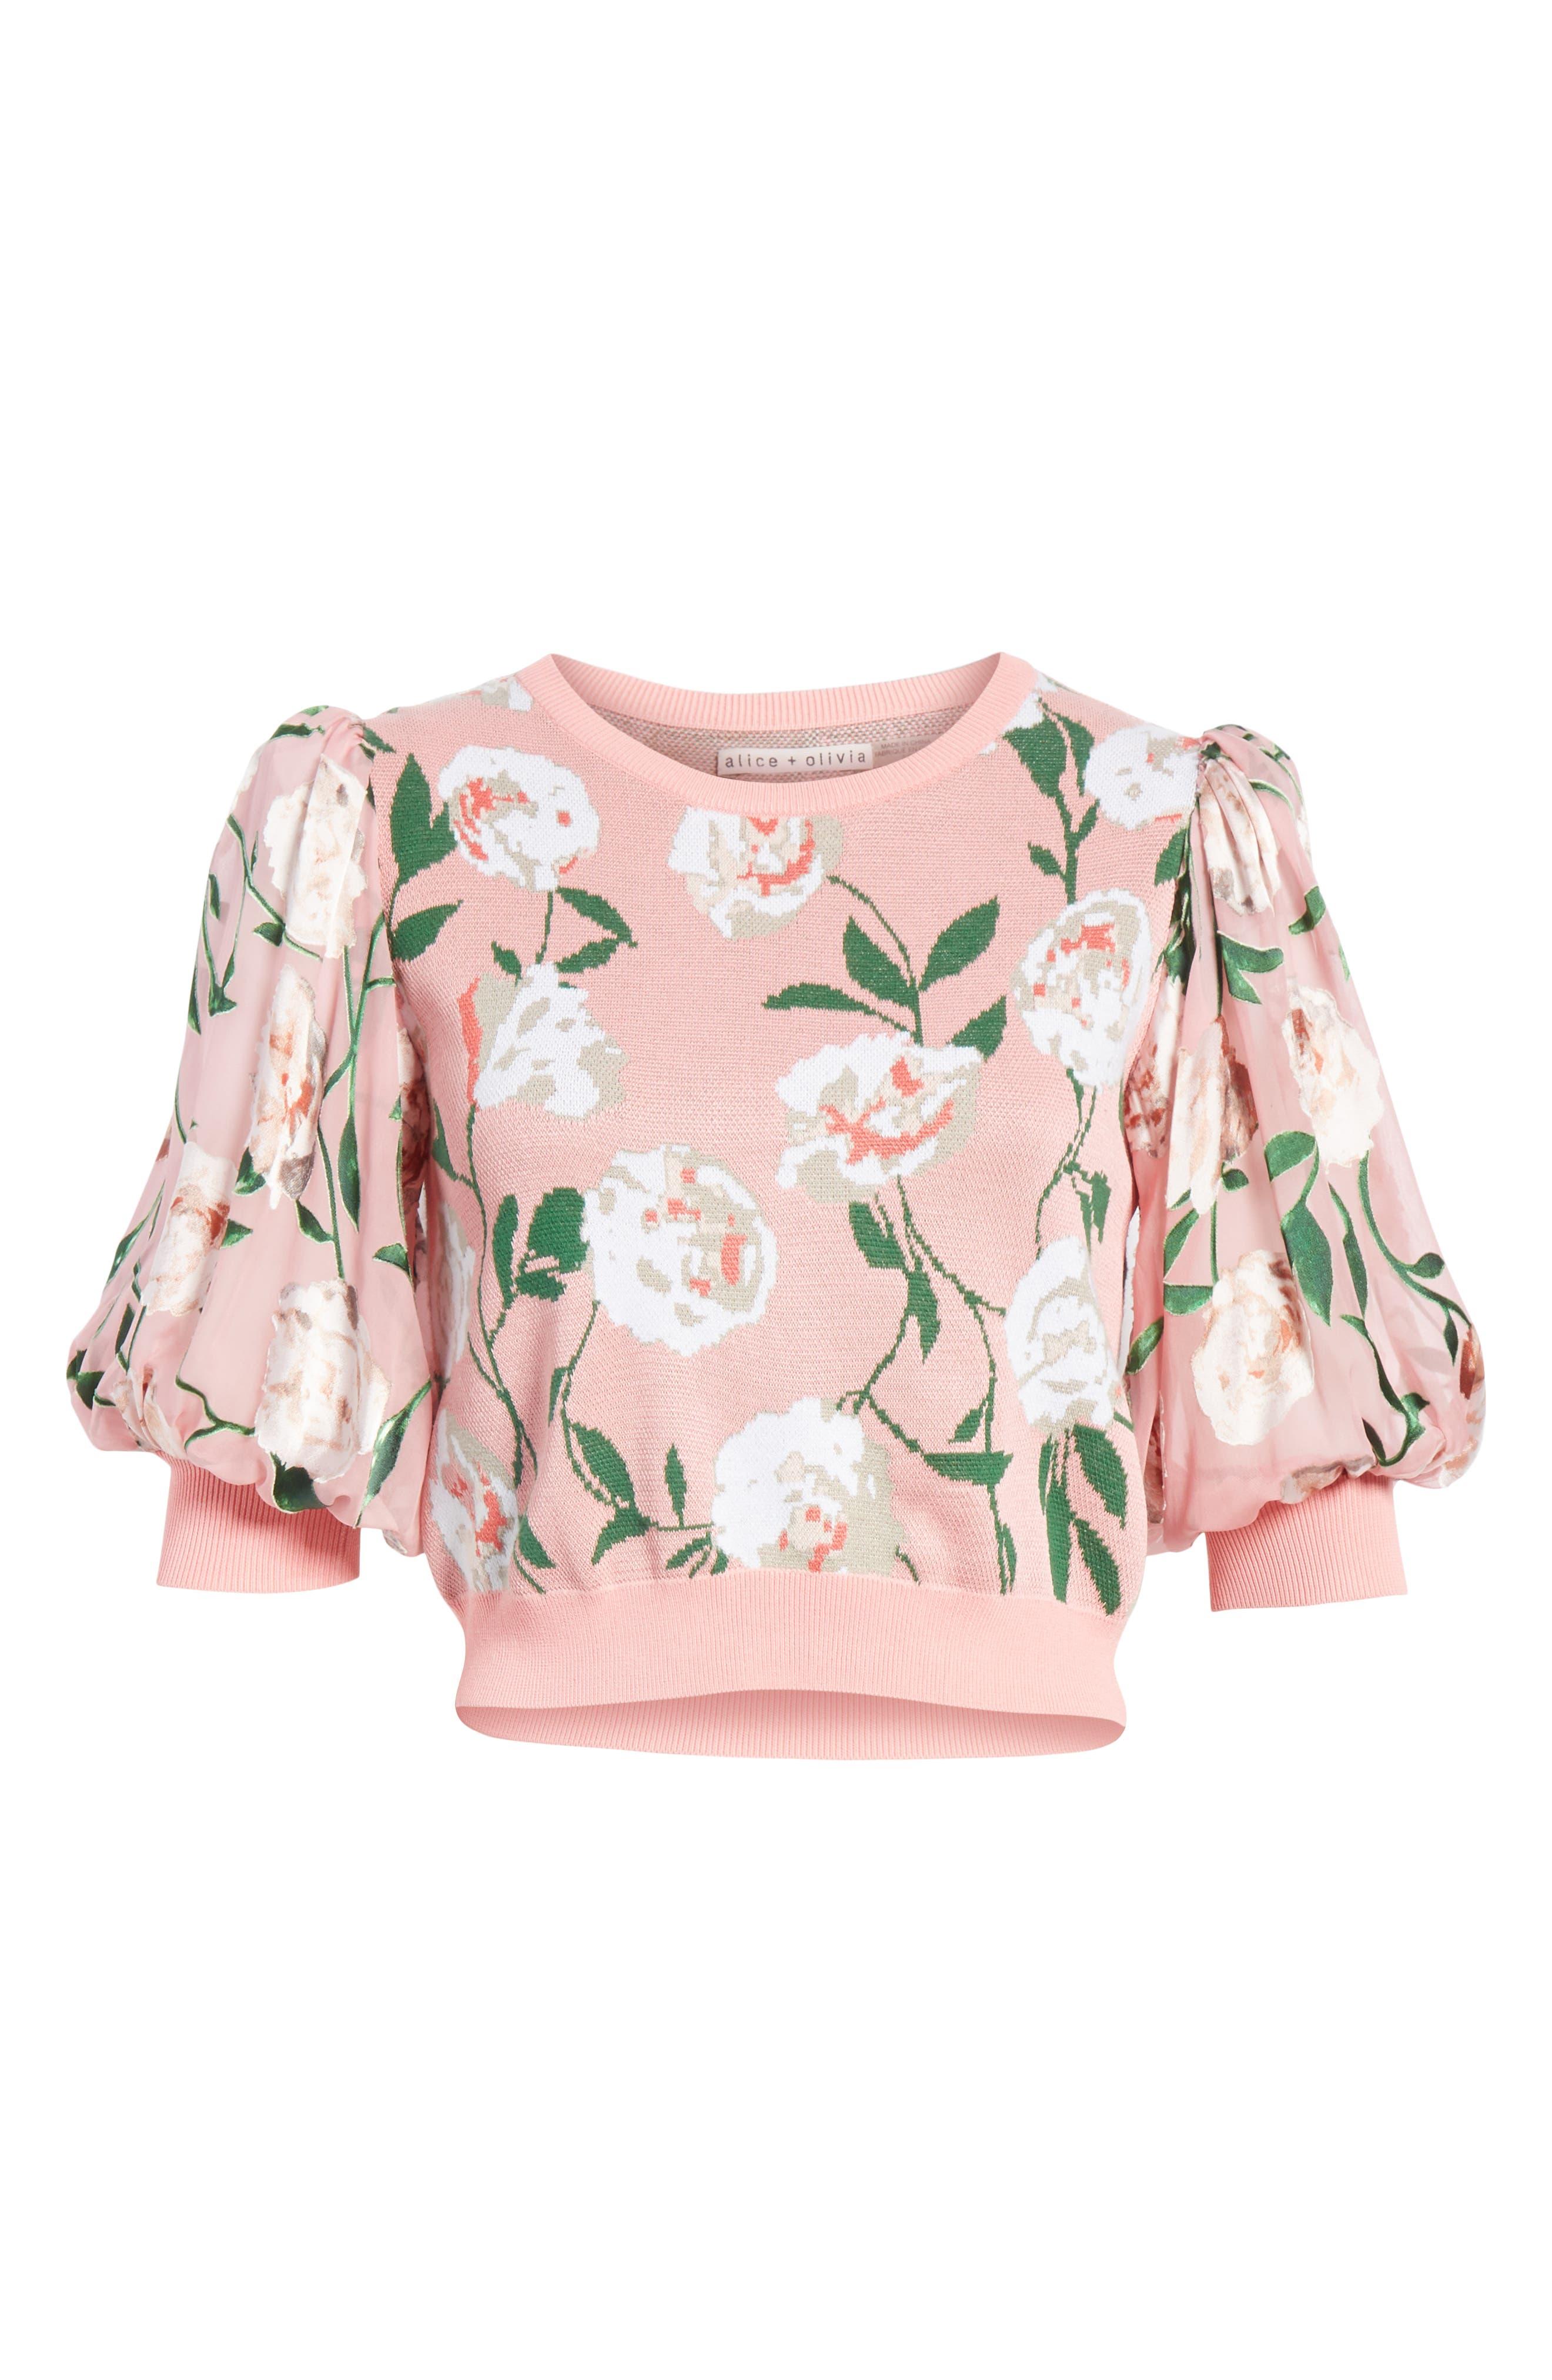 Brandy Floral Puff Crop Sweater,                             Alternate thumbnail 6, color,                             PEONY GARDEN WALL/ BUBBLEGUM